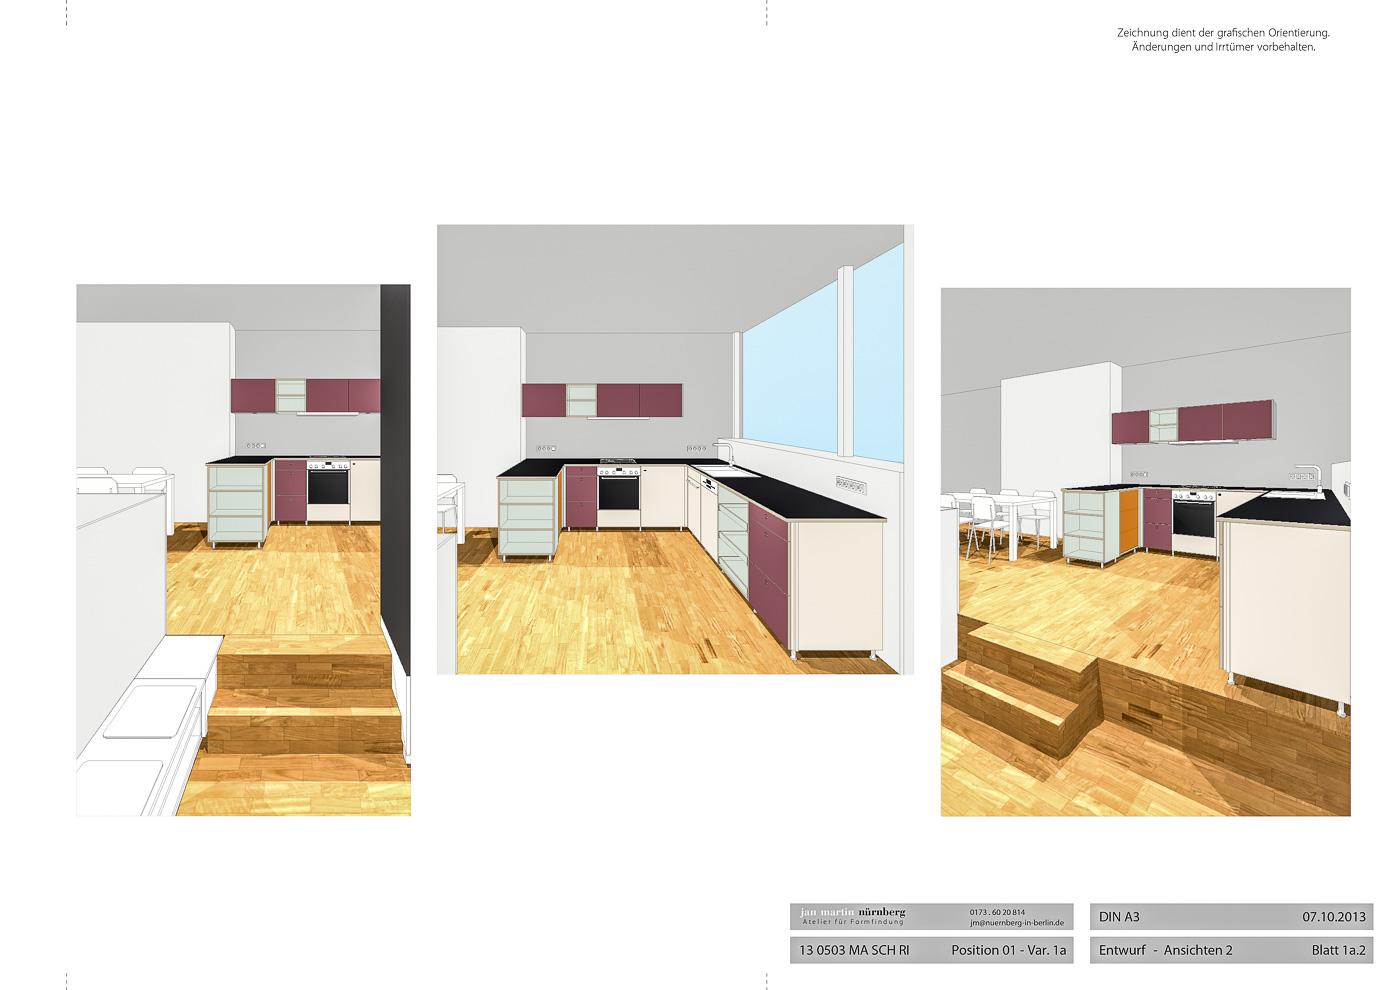 k che und garderobe jan martin n rnberg. Black Bedroom Furniture Sets. Home Design Ideas